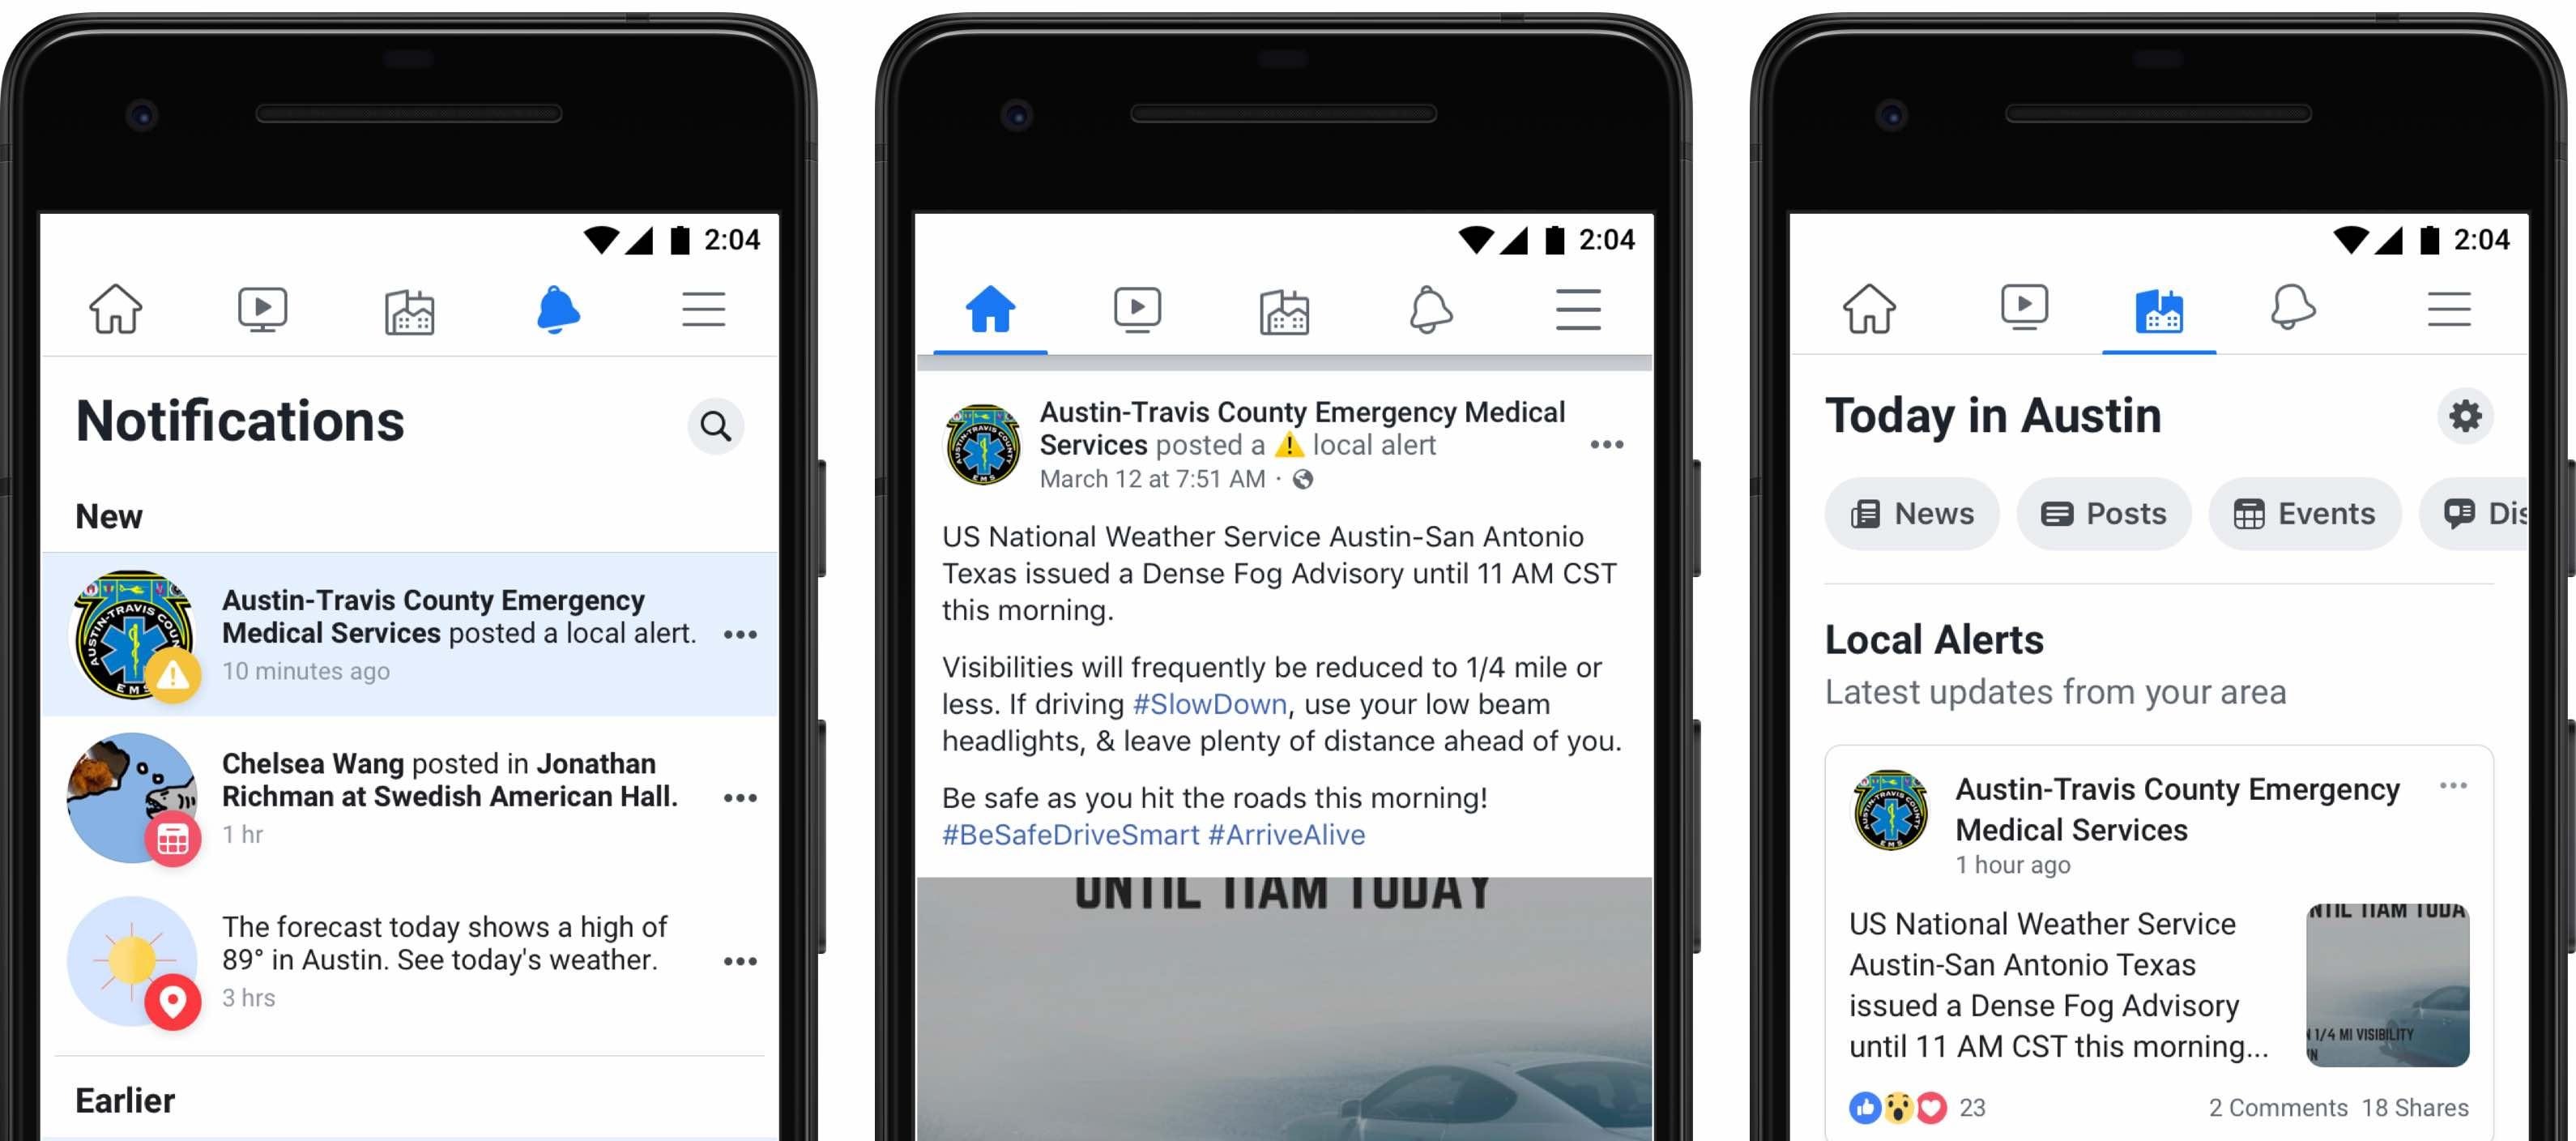 Facebook expands Local Alerts in Australia ahead of bushfire season